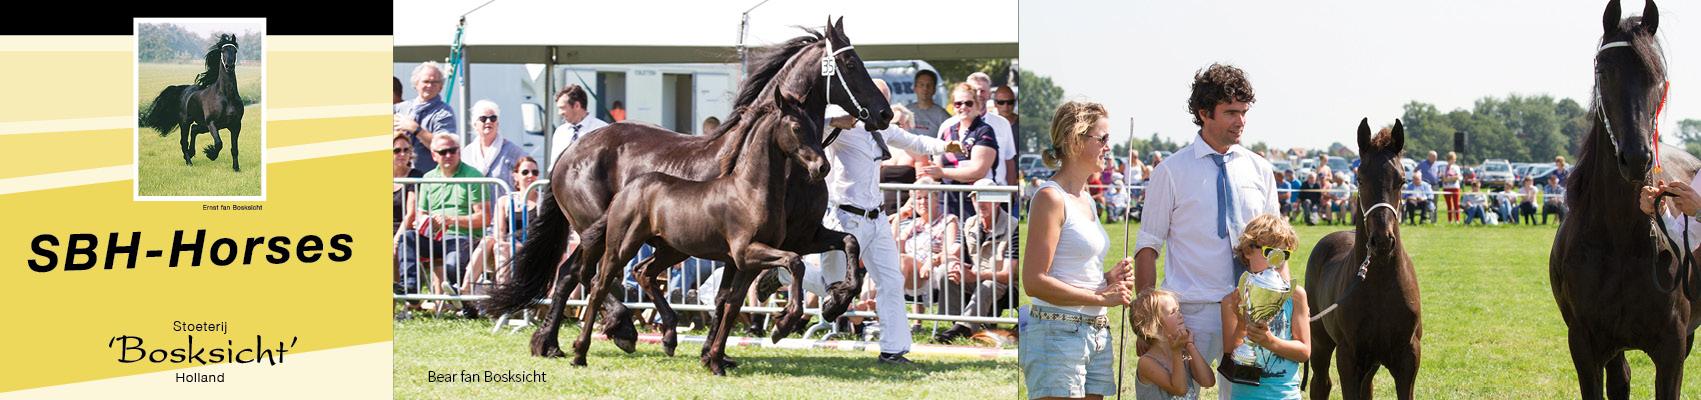 sbhhorses-frisianhorses-slidera8